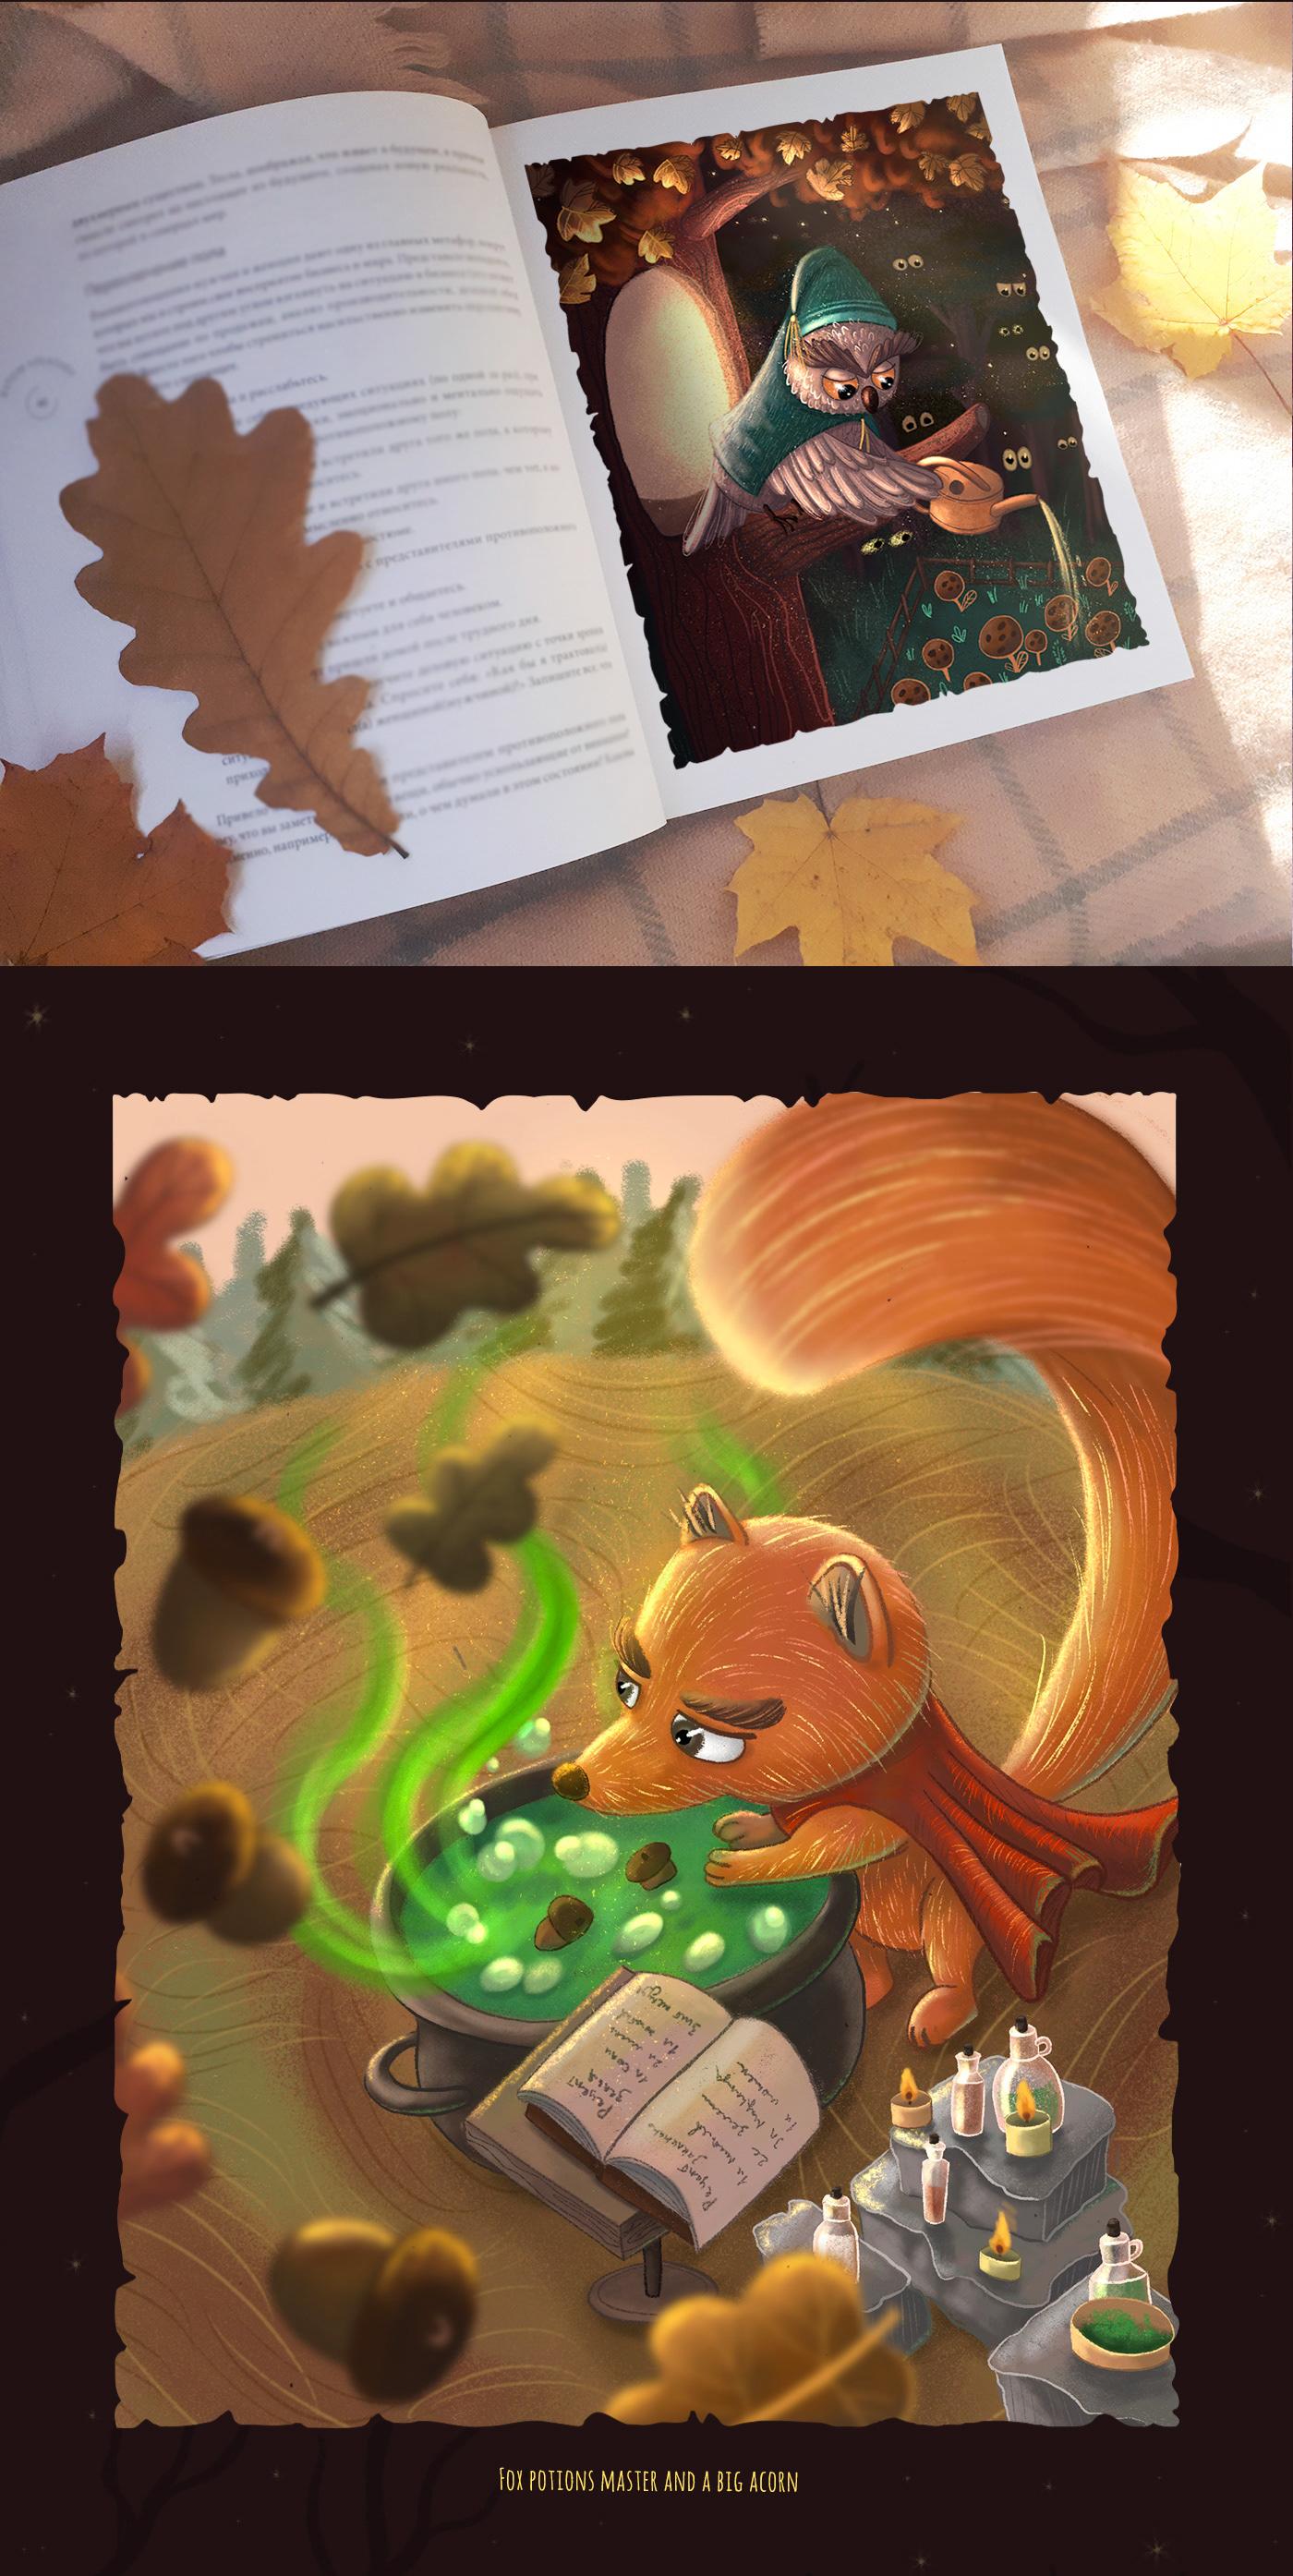 animals book illustration Character design  children book Digital Art  fairytale ILLUSTRATION  kids illustration childrens illustration Picture book